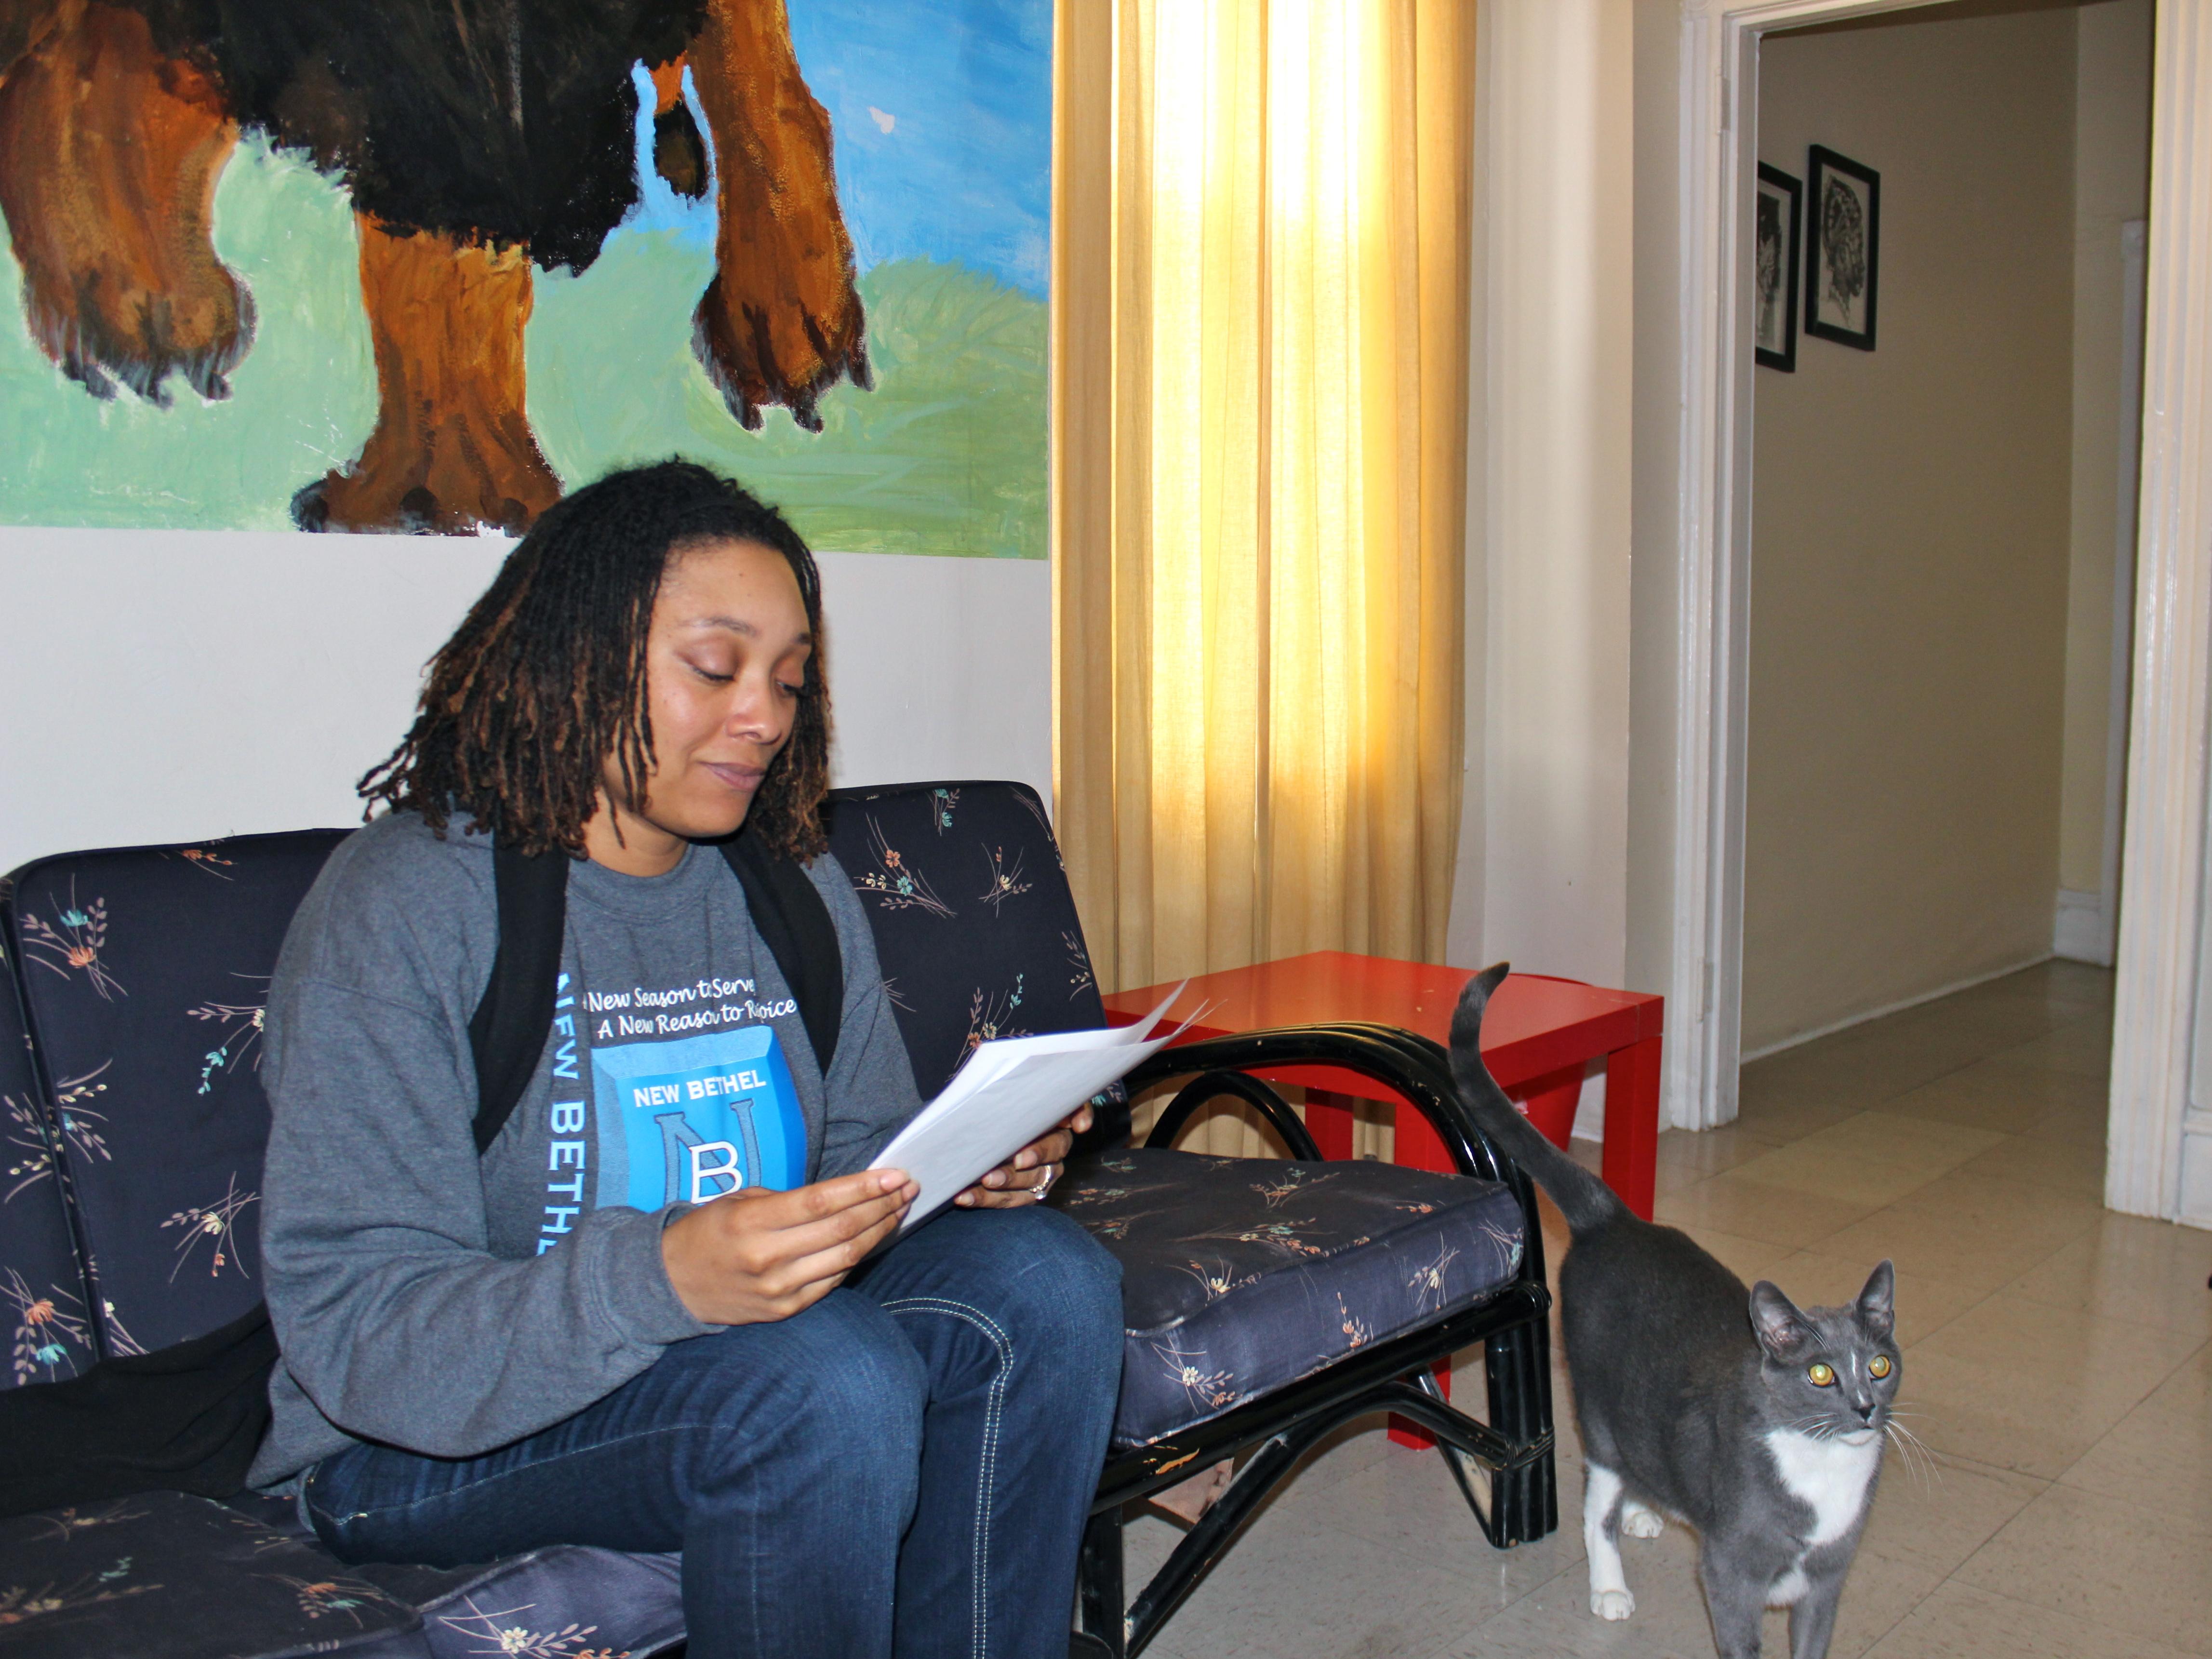 Charmaine Sudler Milligan reviewing paperwork regarding the upcoming classes.